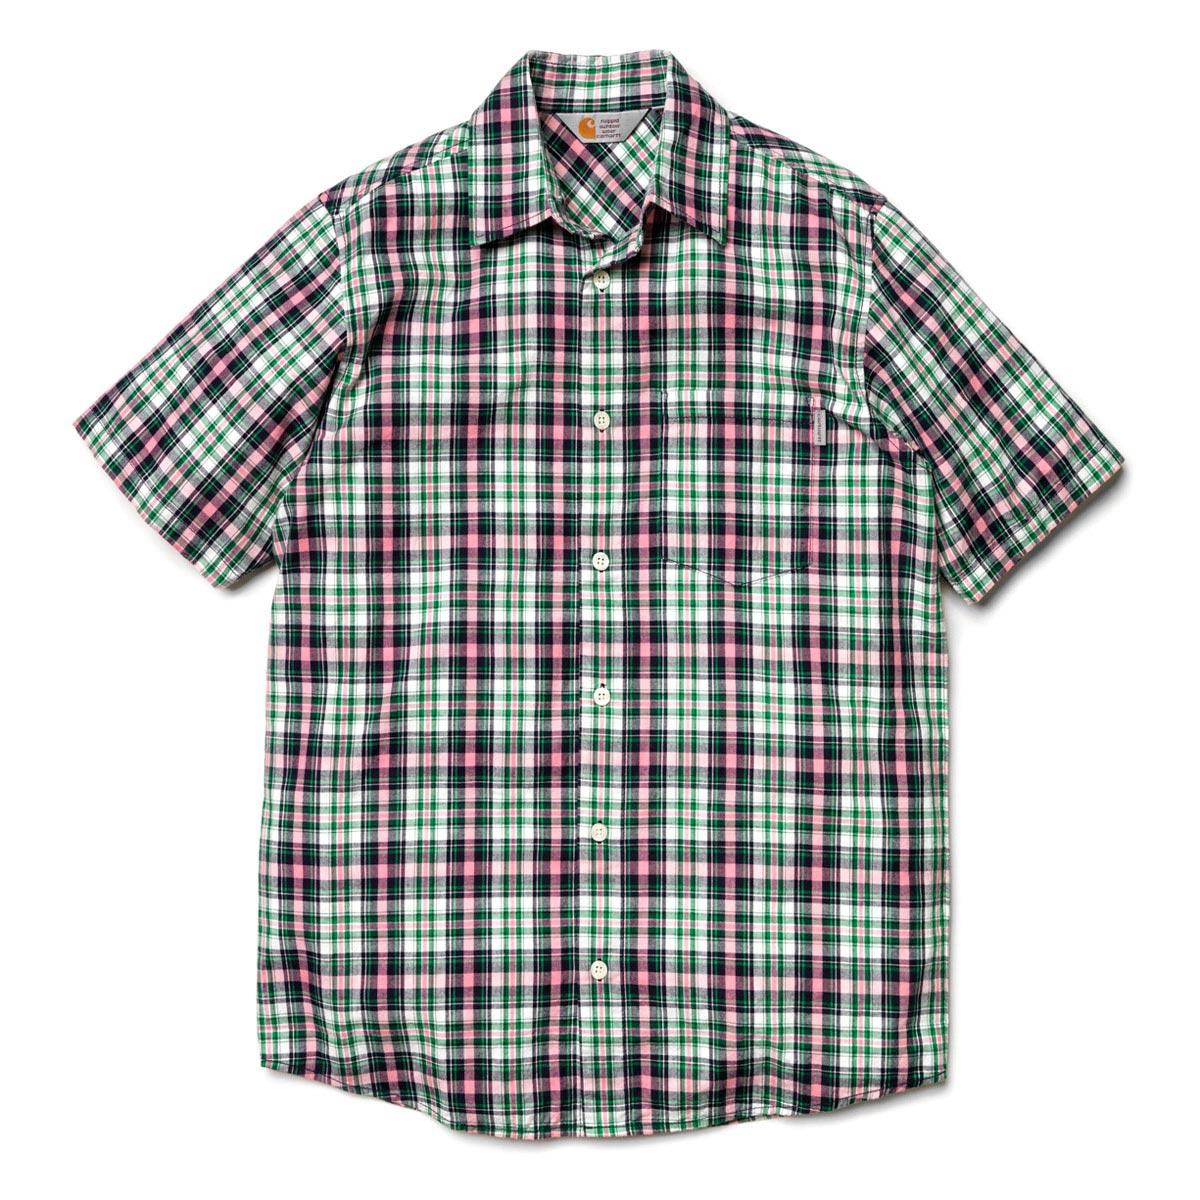 S/S Earl Shirt